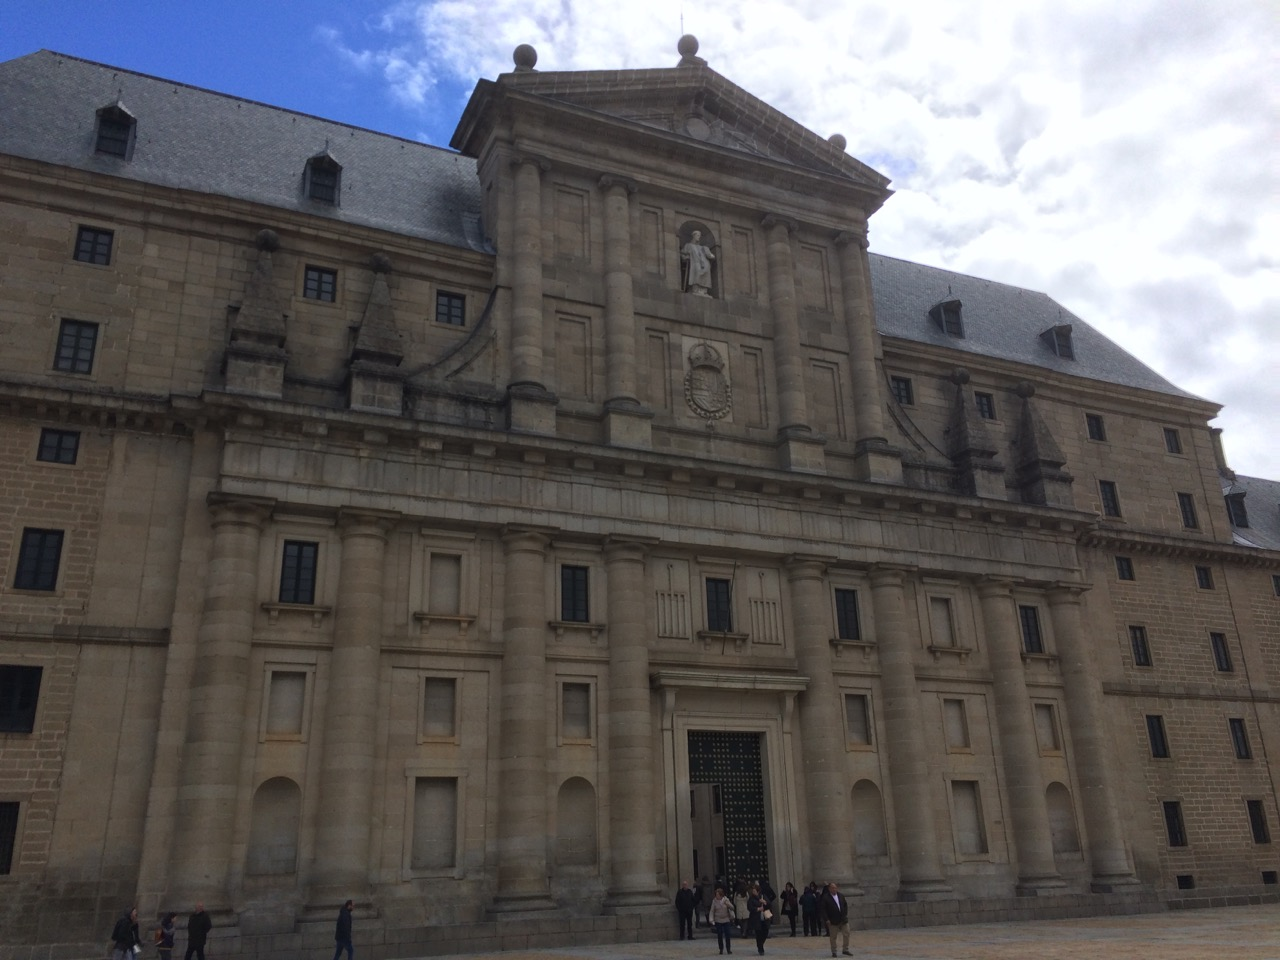 El Escorial's intimidating appearance